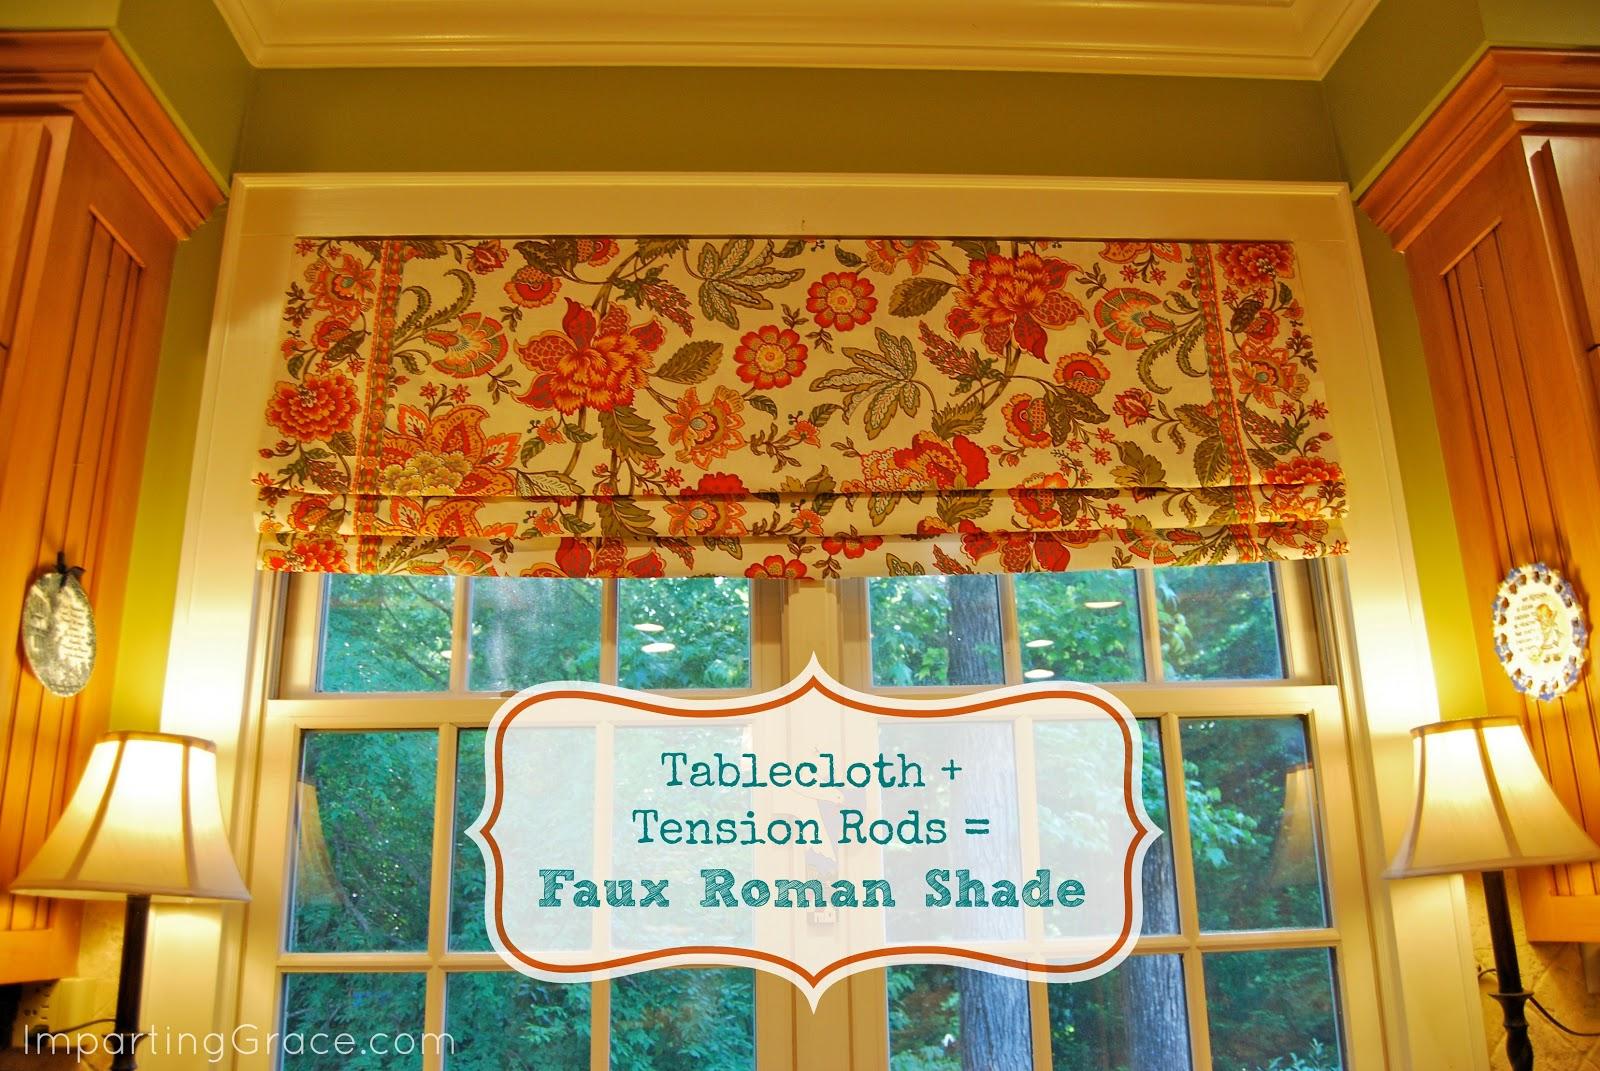 Window treatments for very wide windows - Window Treatments For Very Wide Windows 36